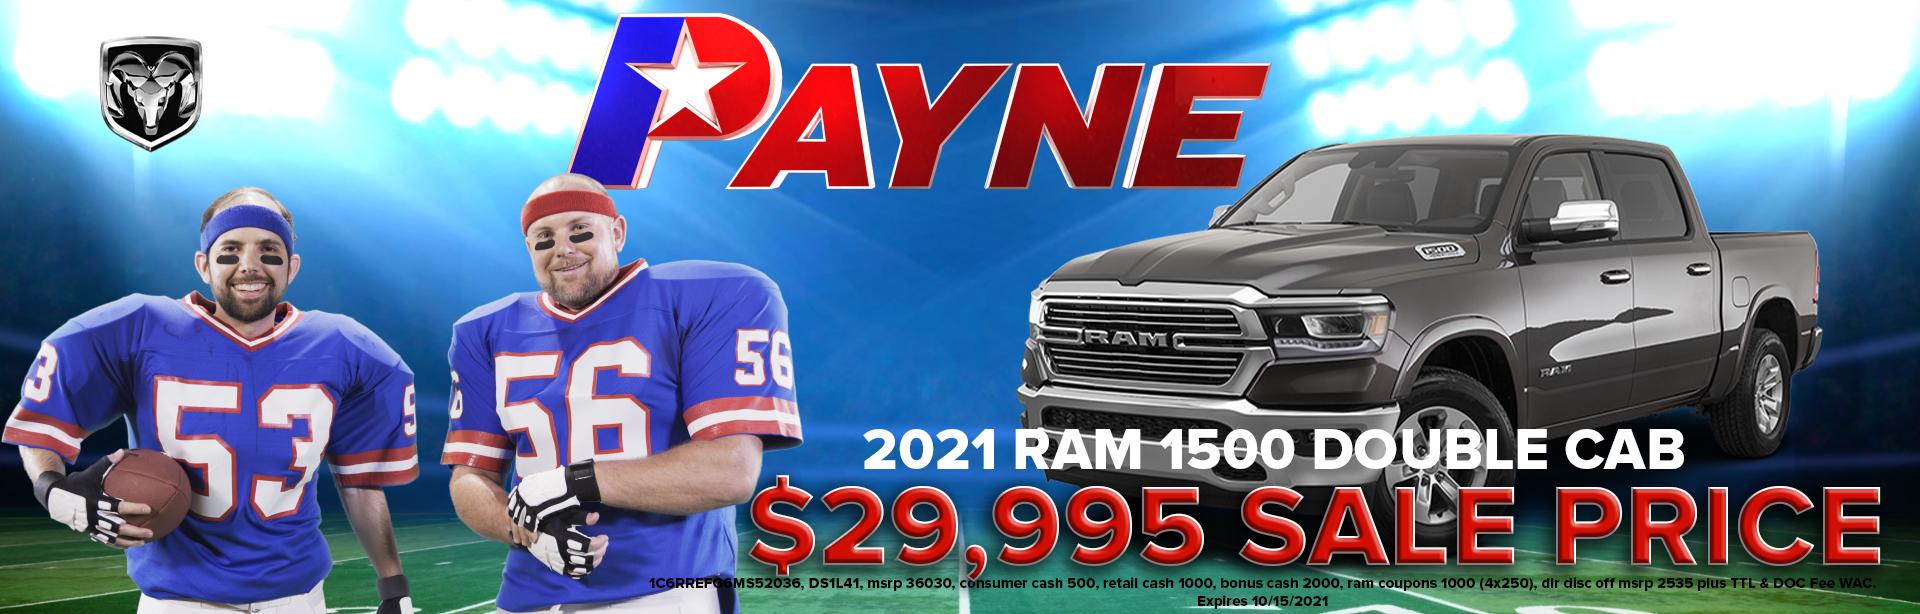 2021 RAM 1500 Double Cab for $29,995 Ed Payne Chrysler Dodge Jeep RAM Weslaco, TX